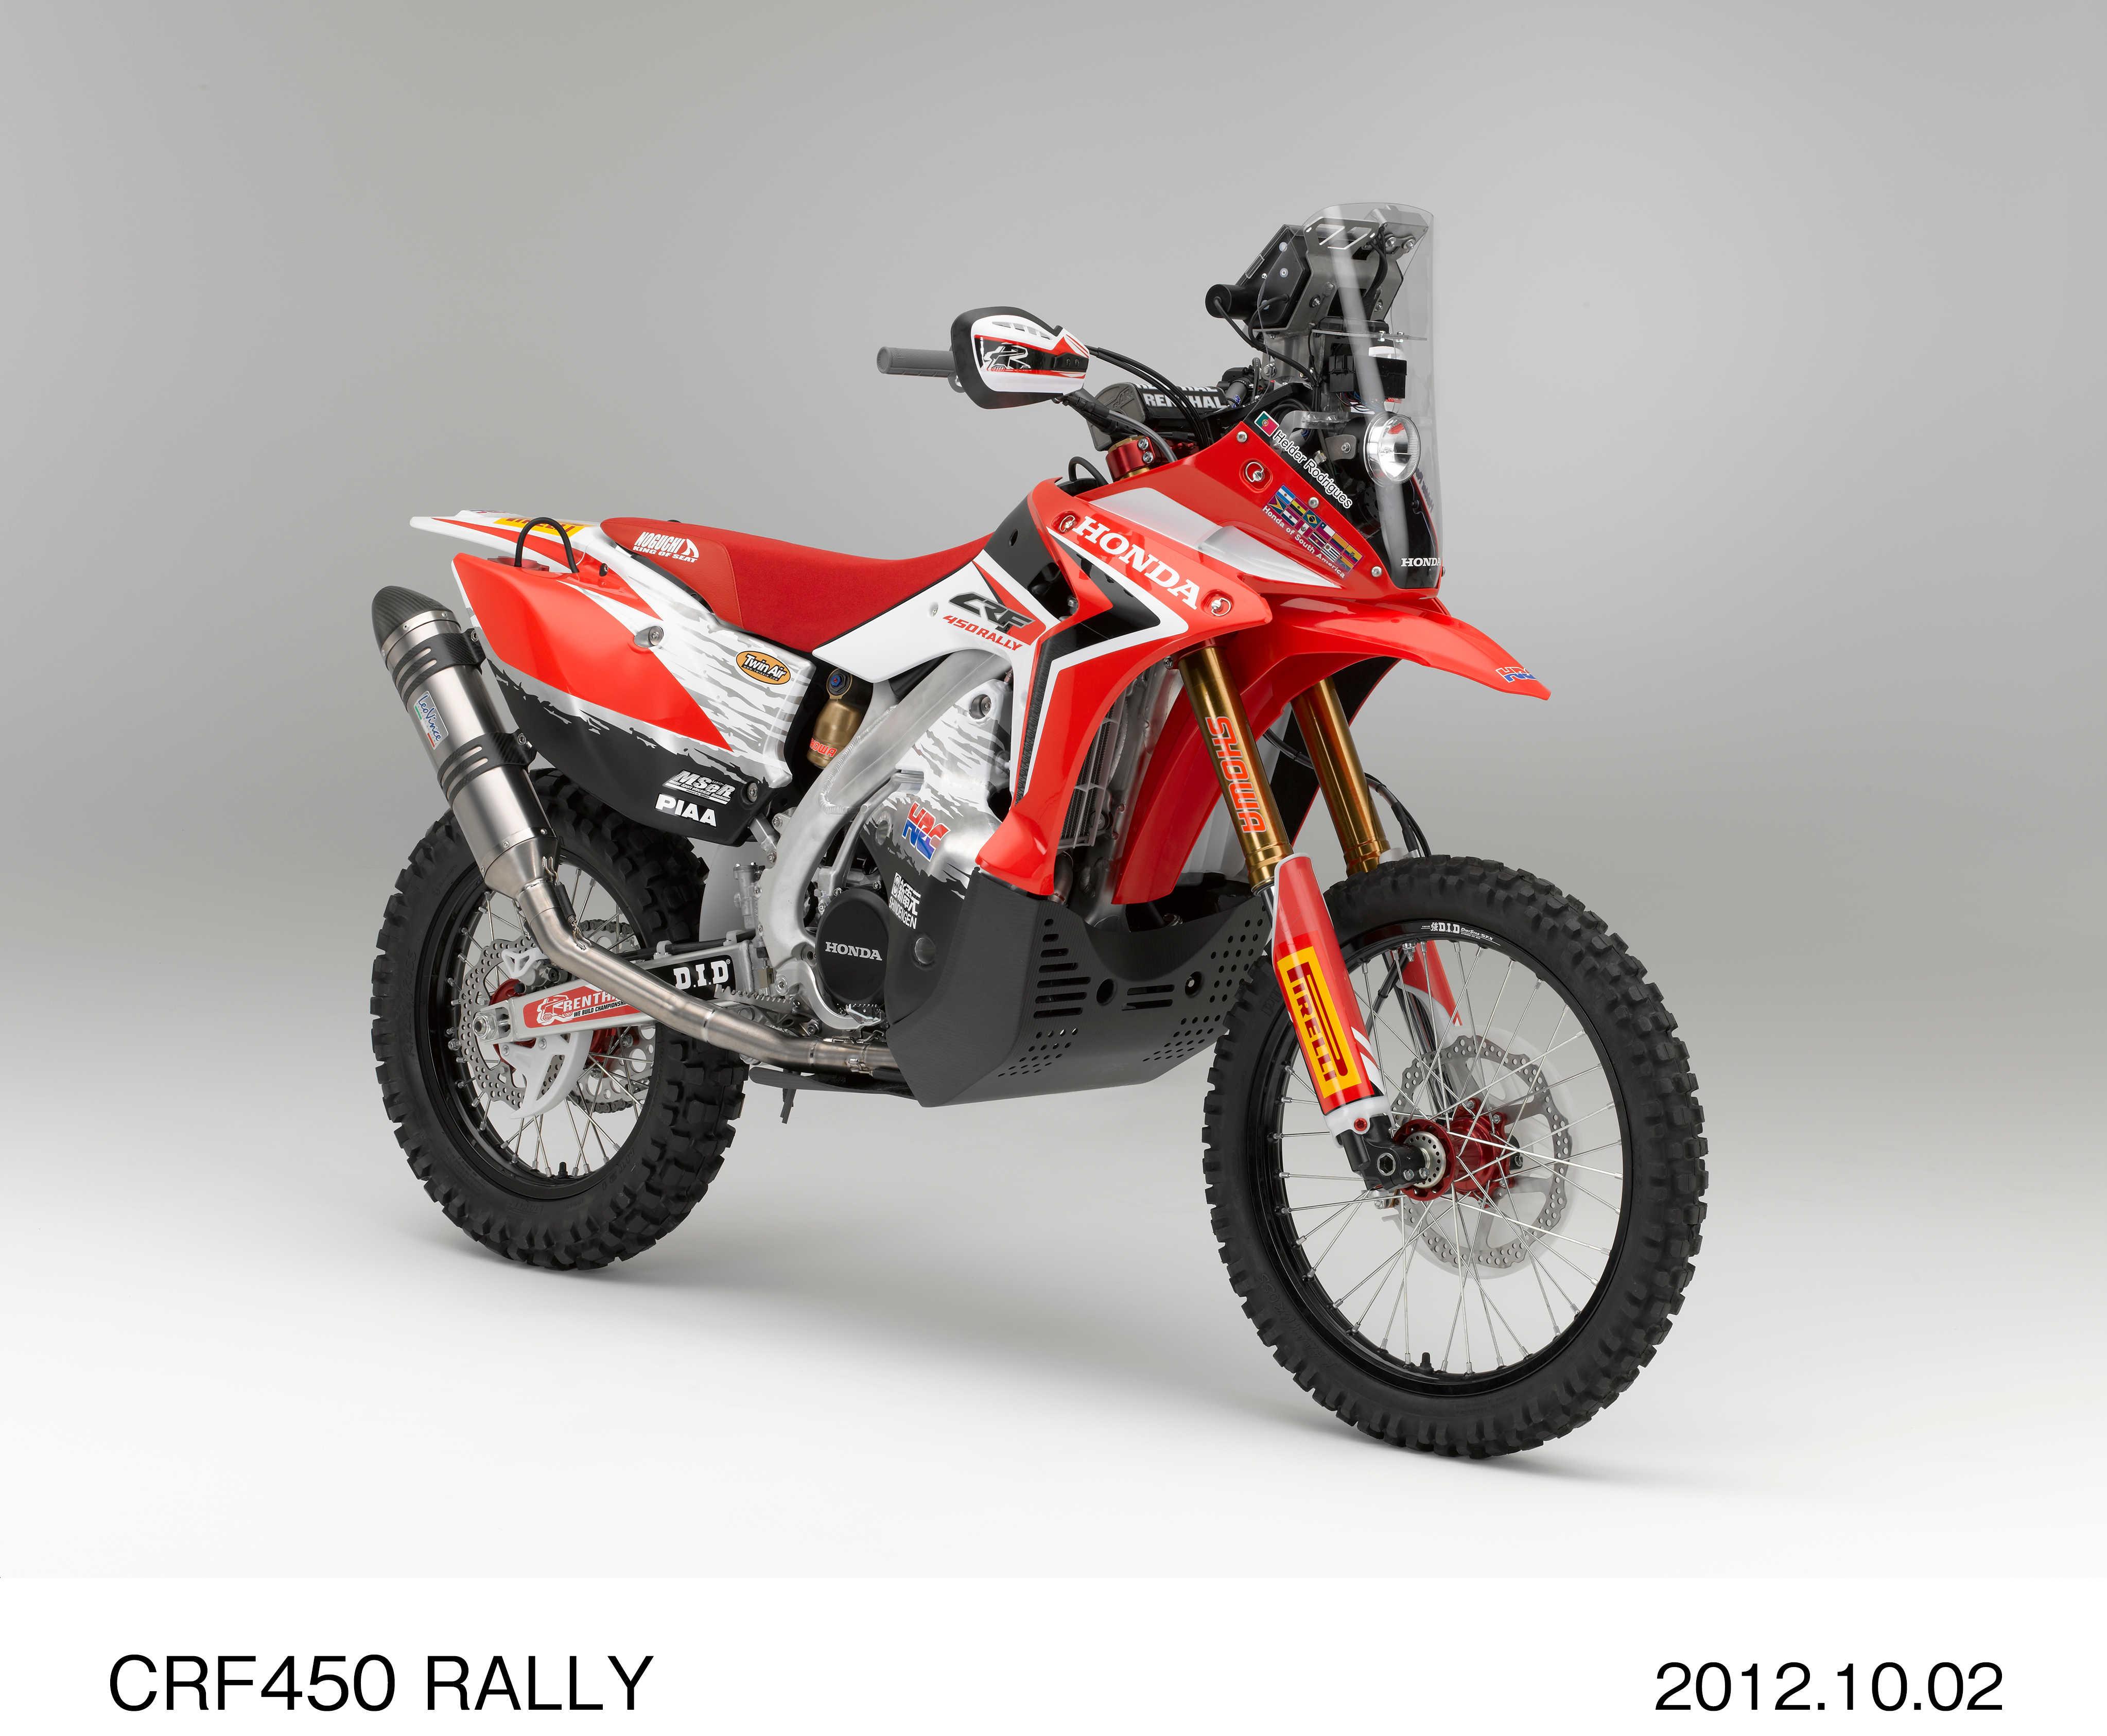 Hondas For Sale >> Intermot: Honda's CRF450 Rally | Visordown